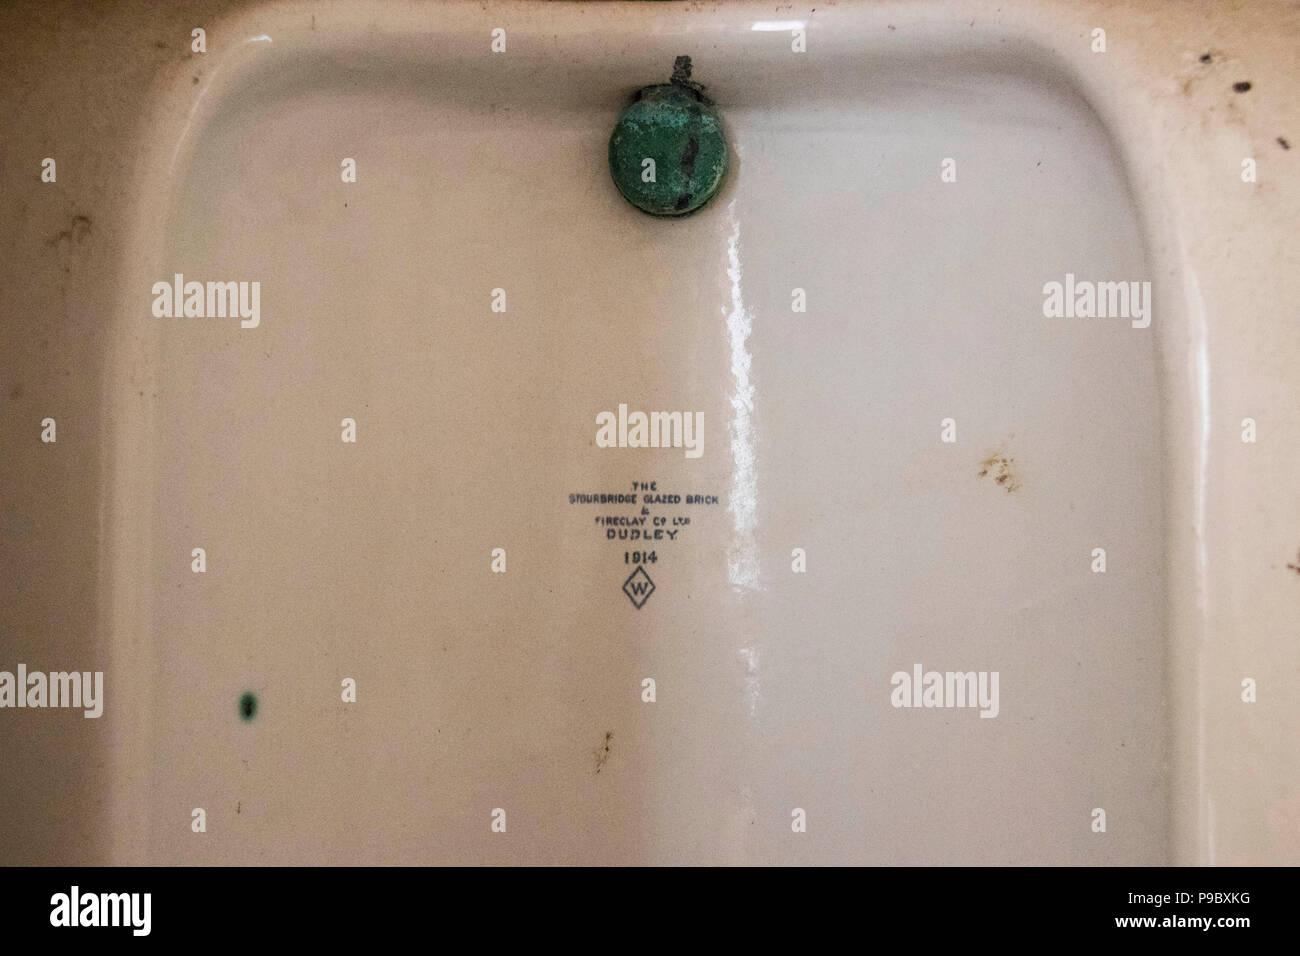 Antique Urinal Stock Photos & Antique Urinal Stock Images - Alamy